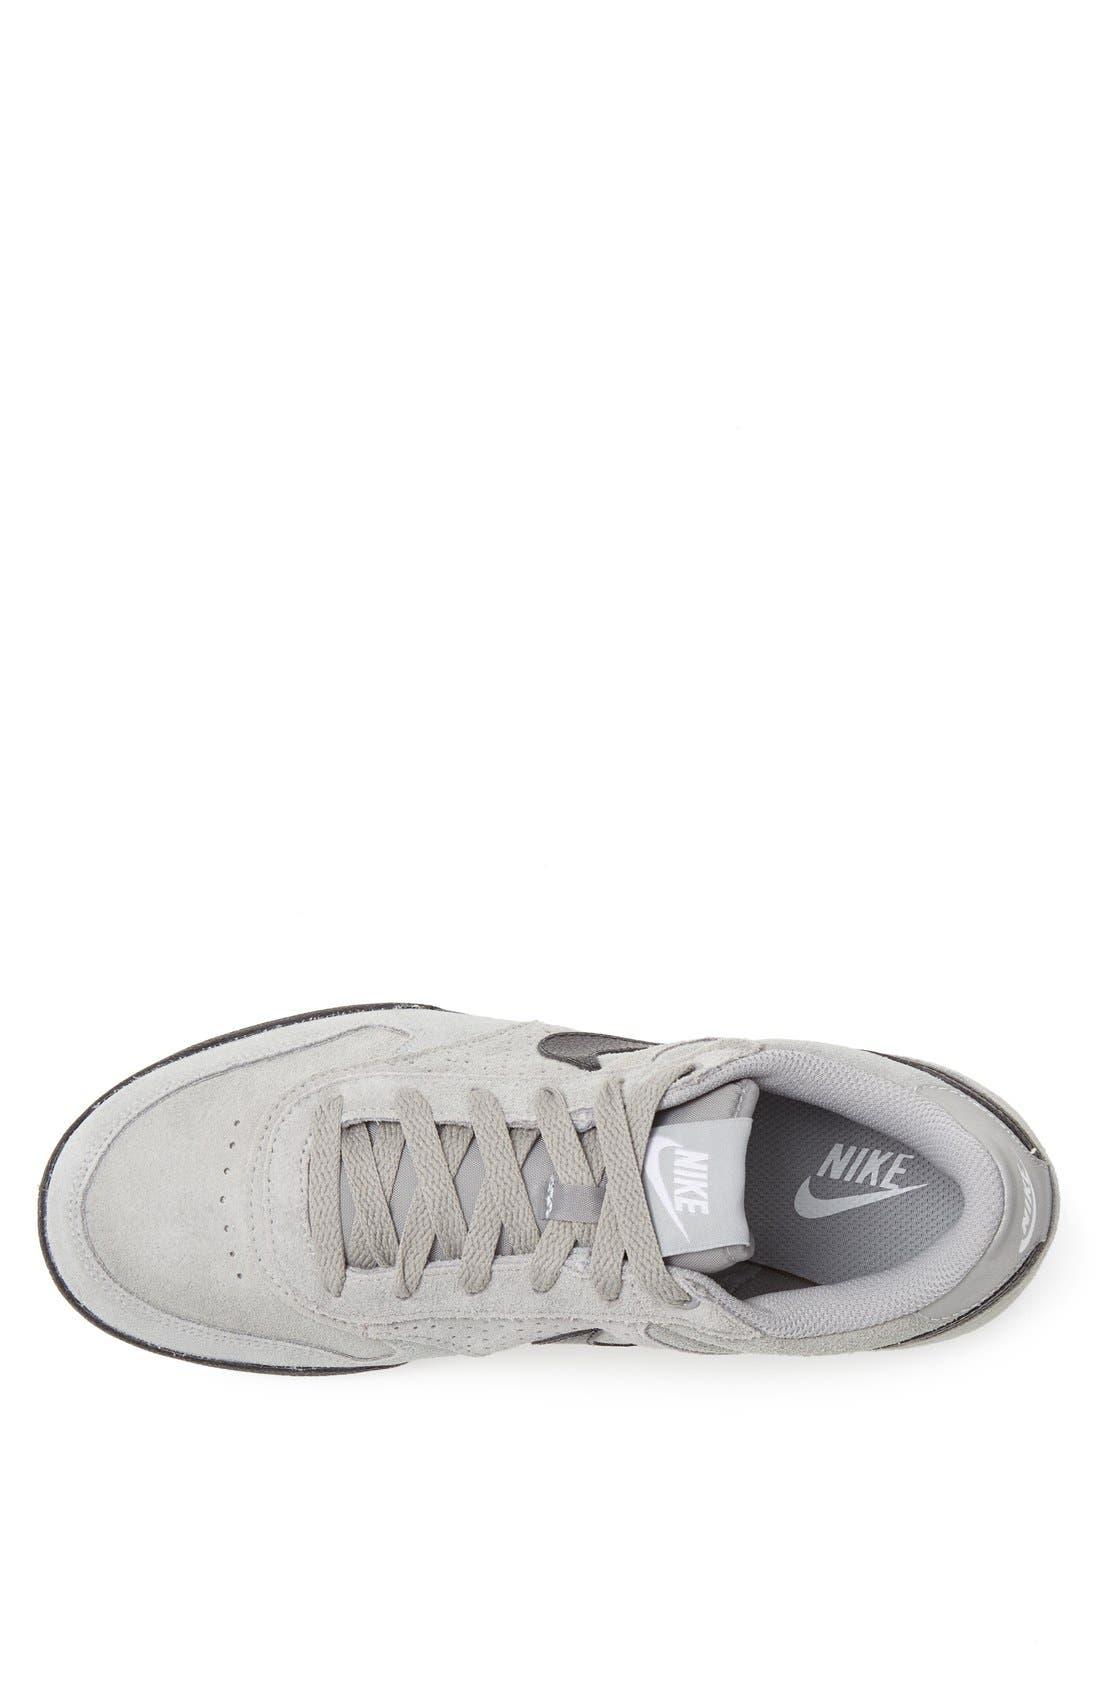 Alternate Image 3  - Nike 'Field Trainer' Sneaker (Men)